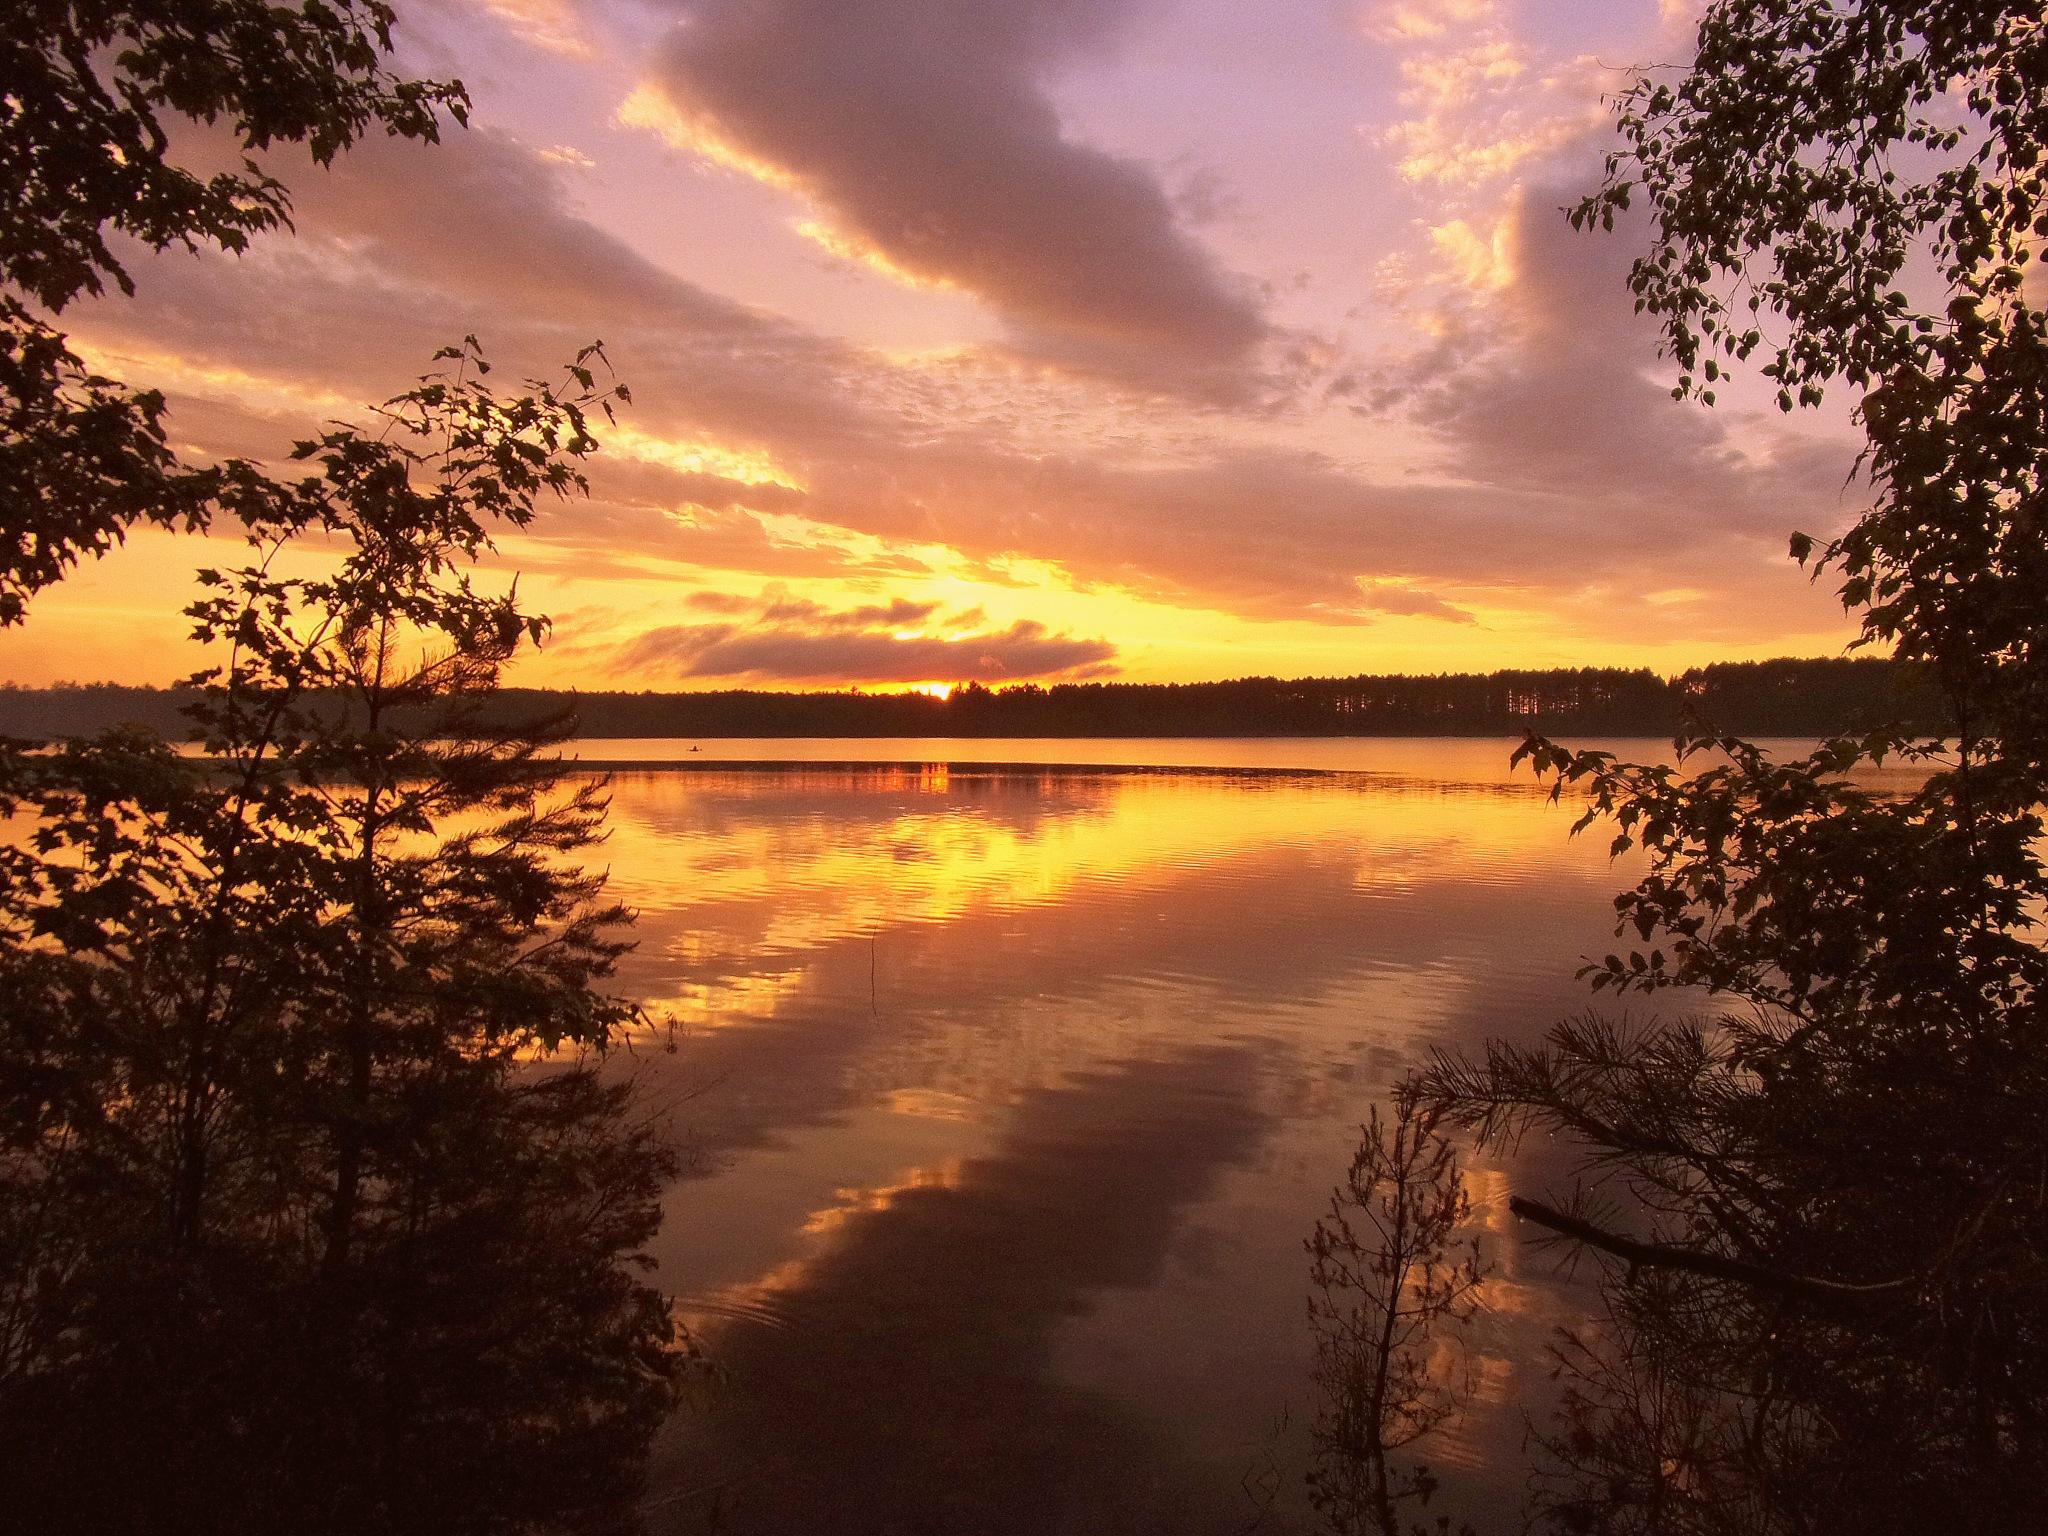 Crystal Lake Sunset by Gregg Michael